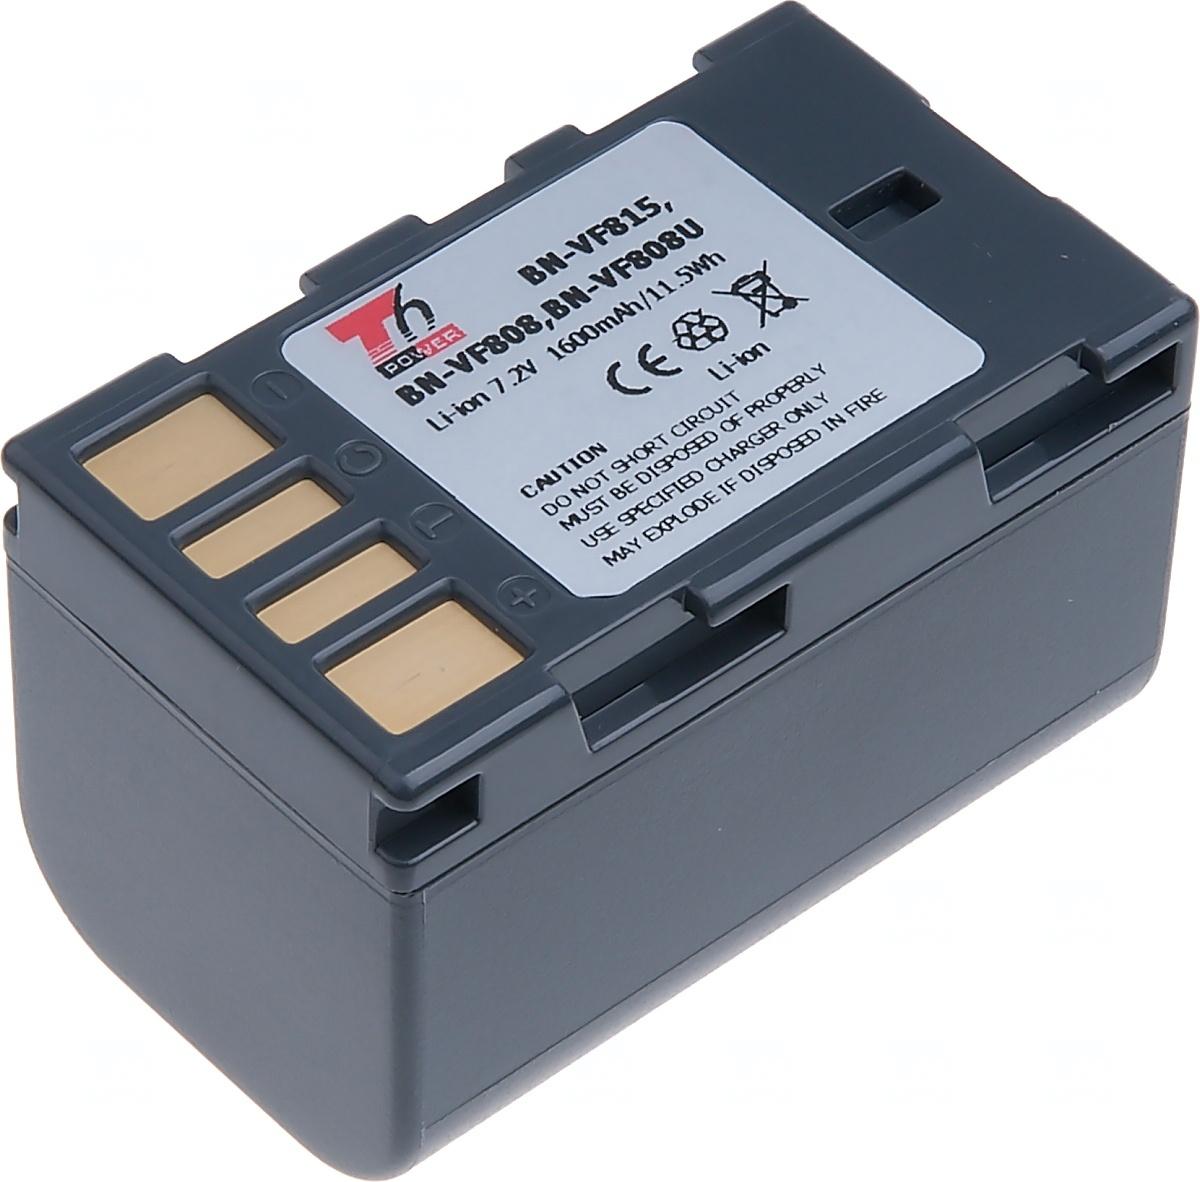 Baterie T6 power JVC BN-VF808, VF815, 1600mAh, šedá